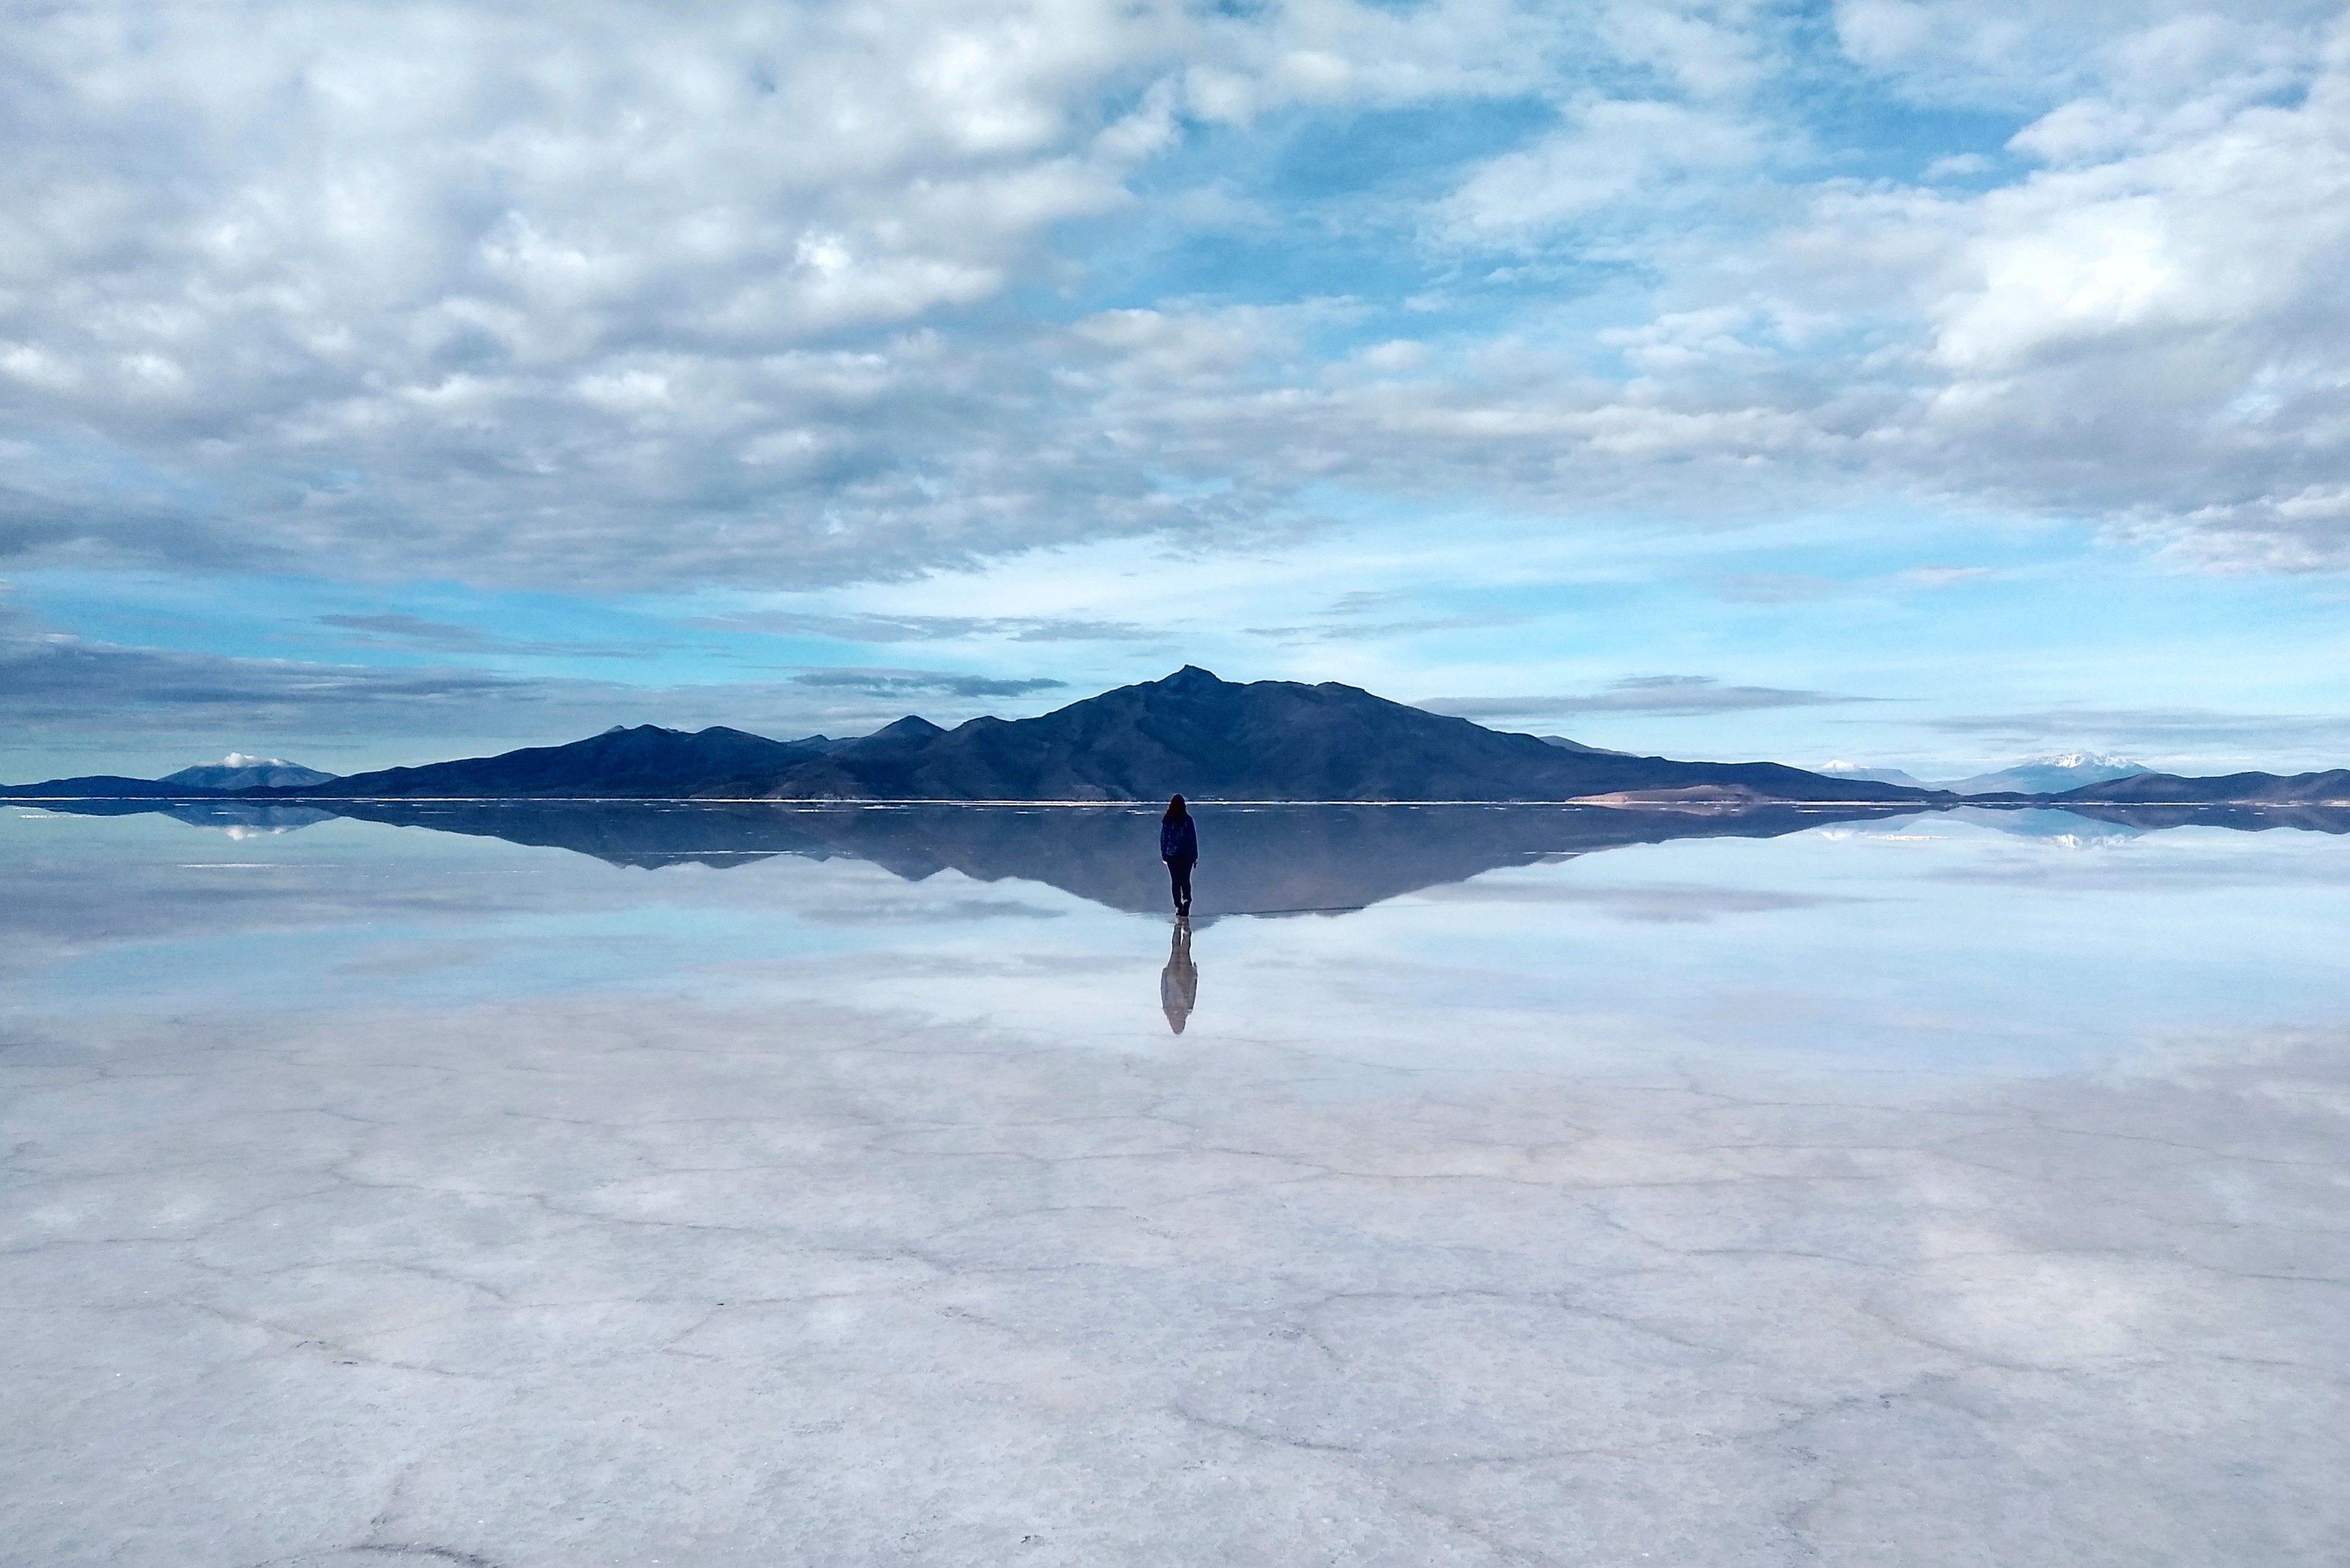 Woman walking in Salar de Uyuni, Bolivia.